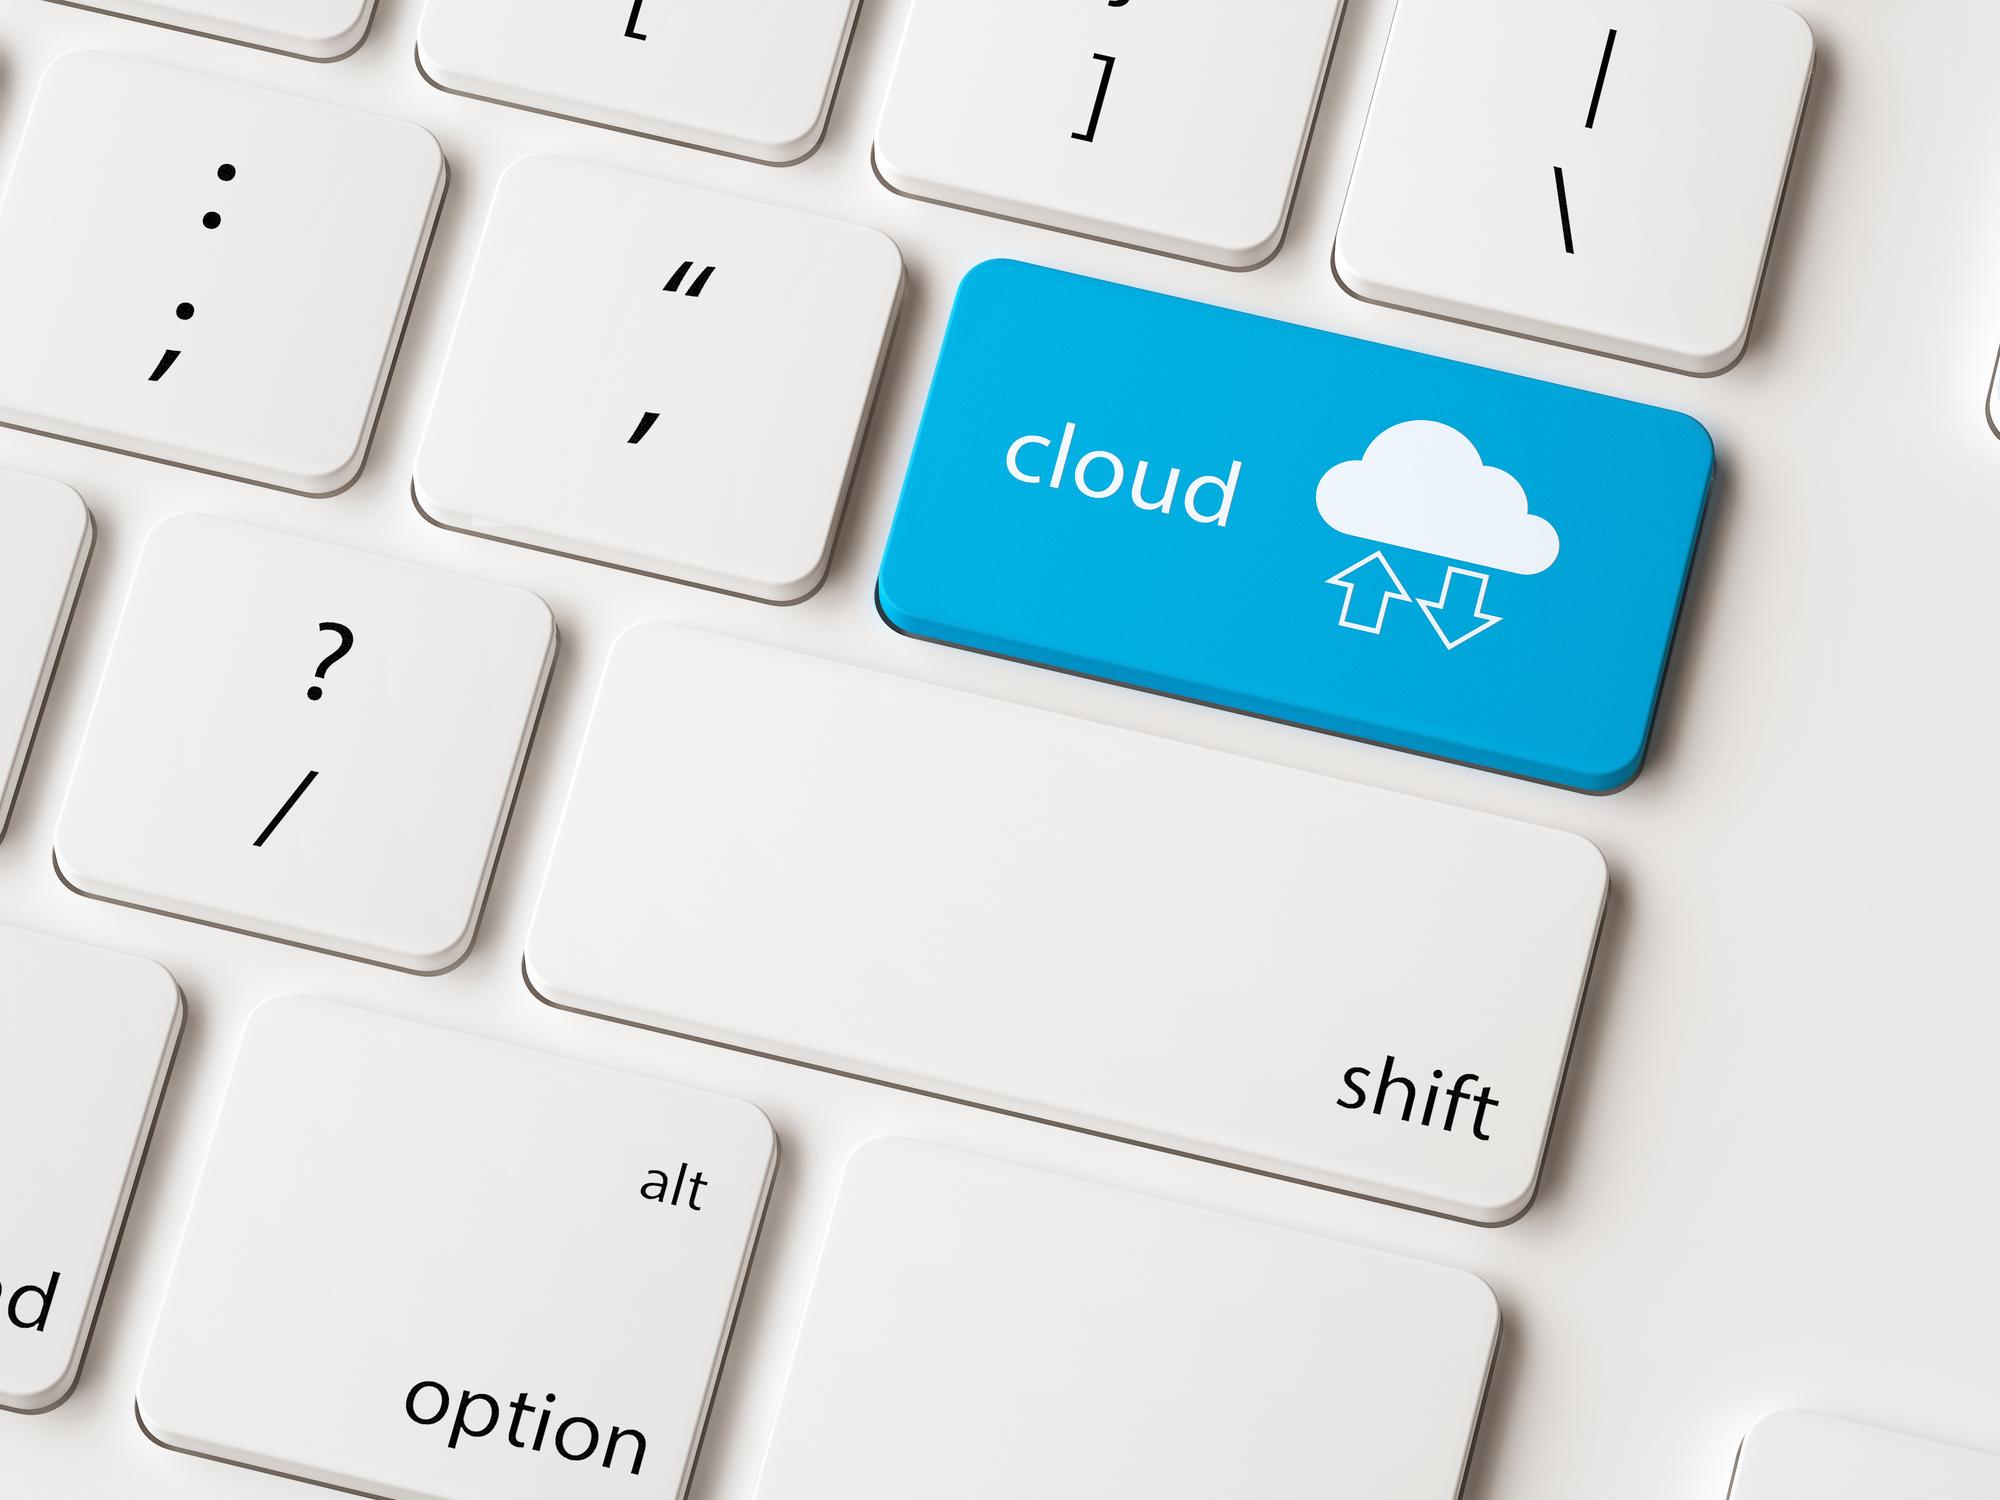 Key denoting cloud computing on a keyboard.